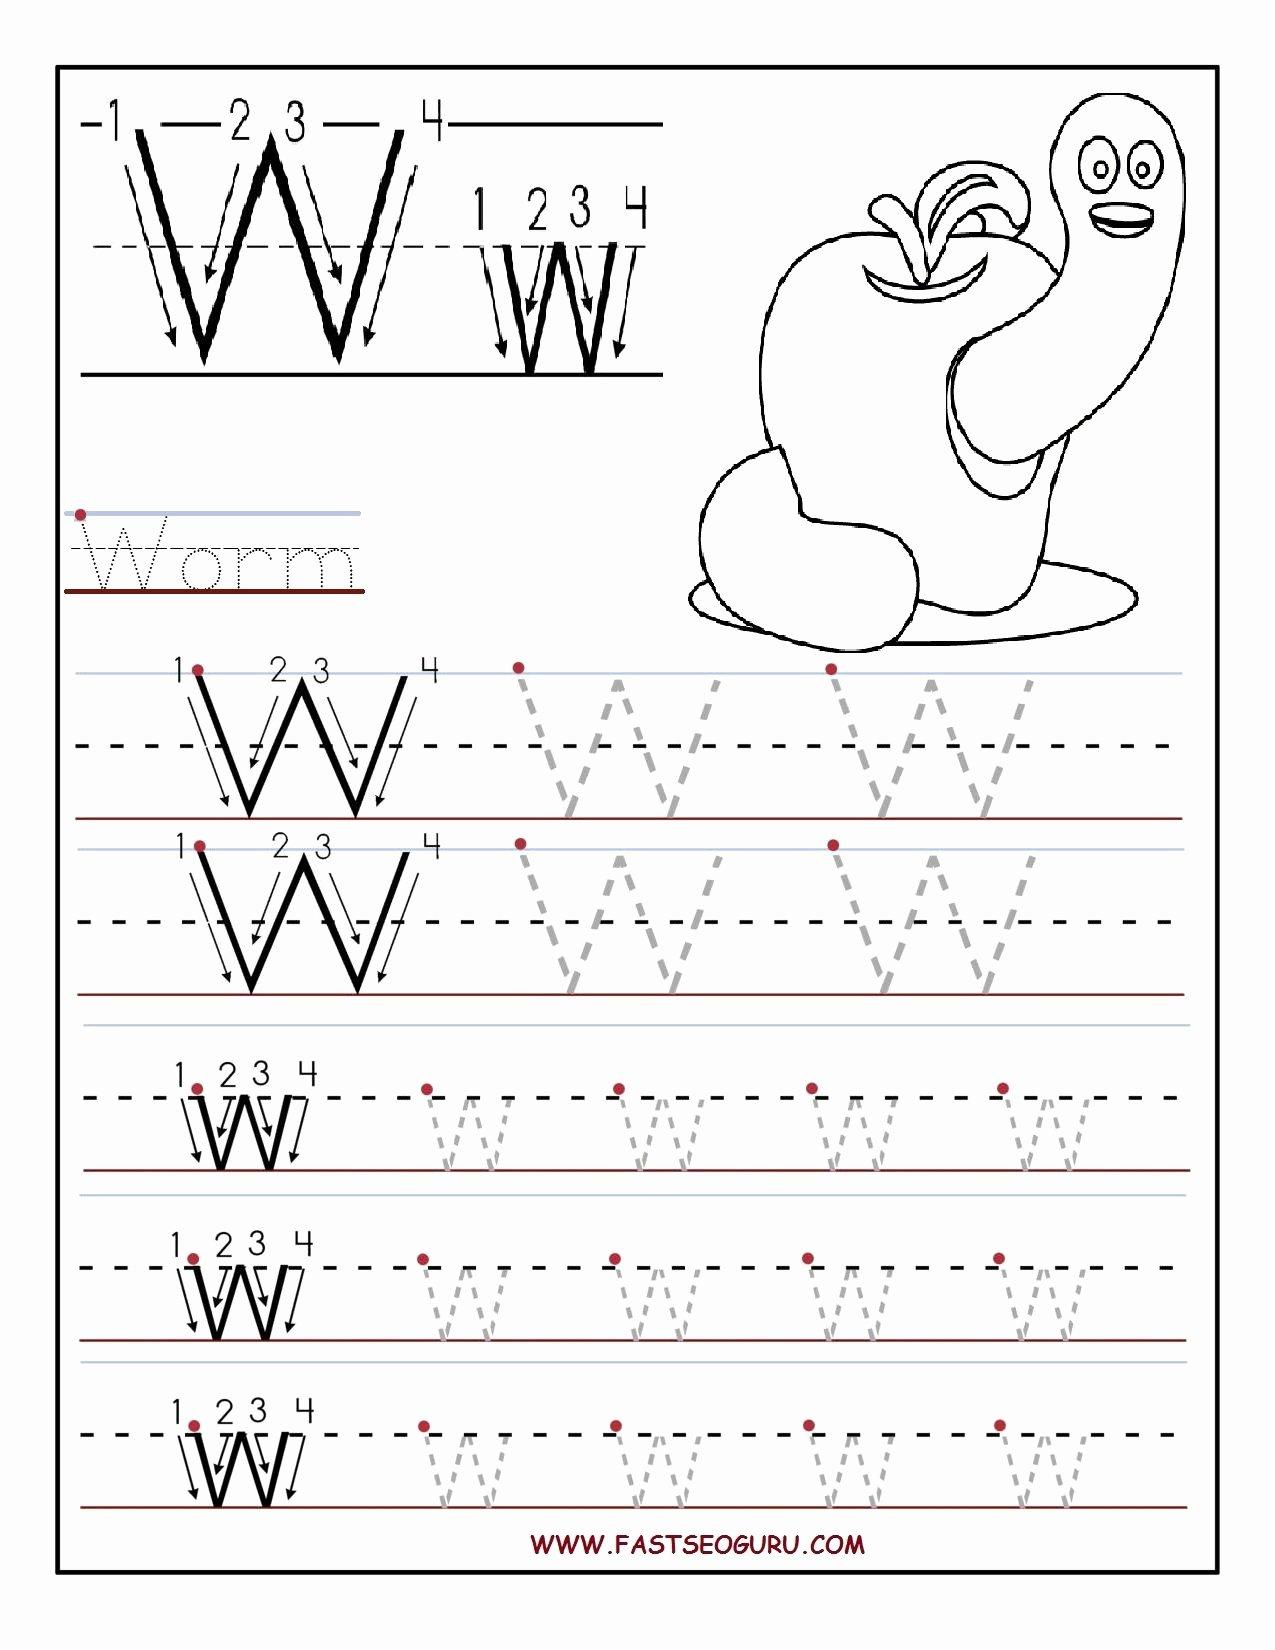 Letter W Worksheets for Preschoolers Ideas Printable Letter W Tracing Worksheets for Preschool